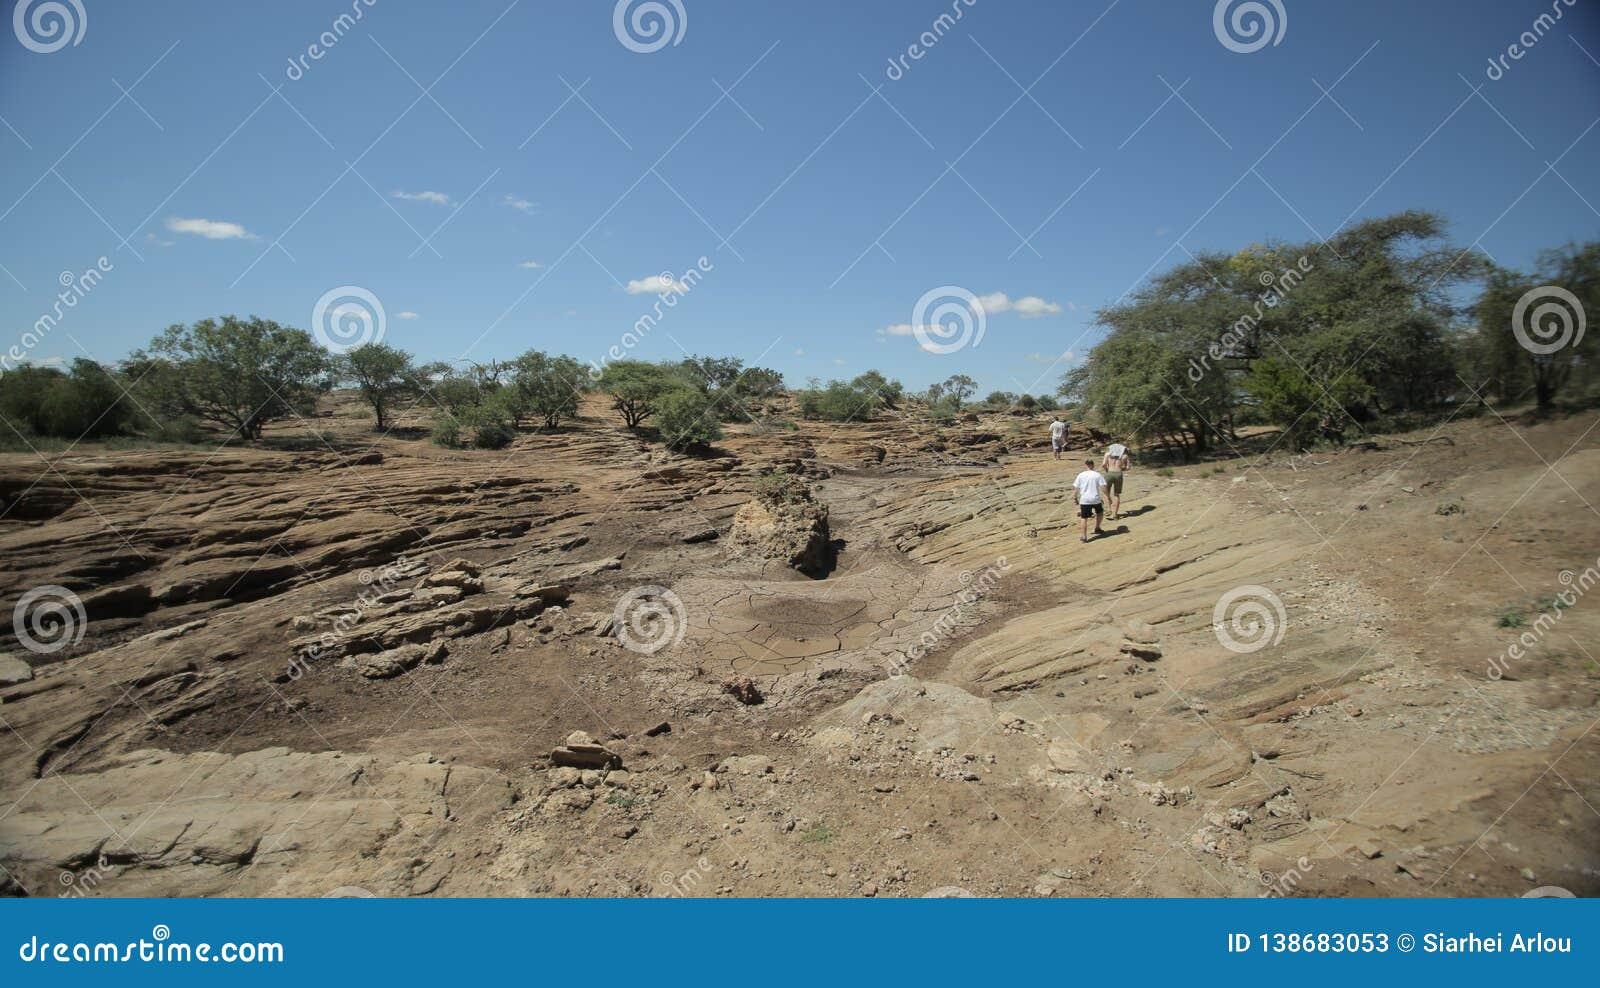 Beautiful Landscape Of A Desert In Africa, Kenya  Man